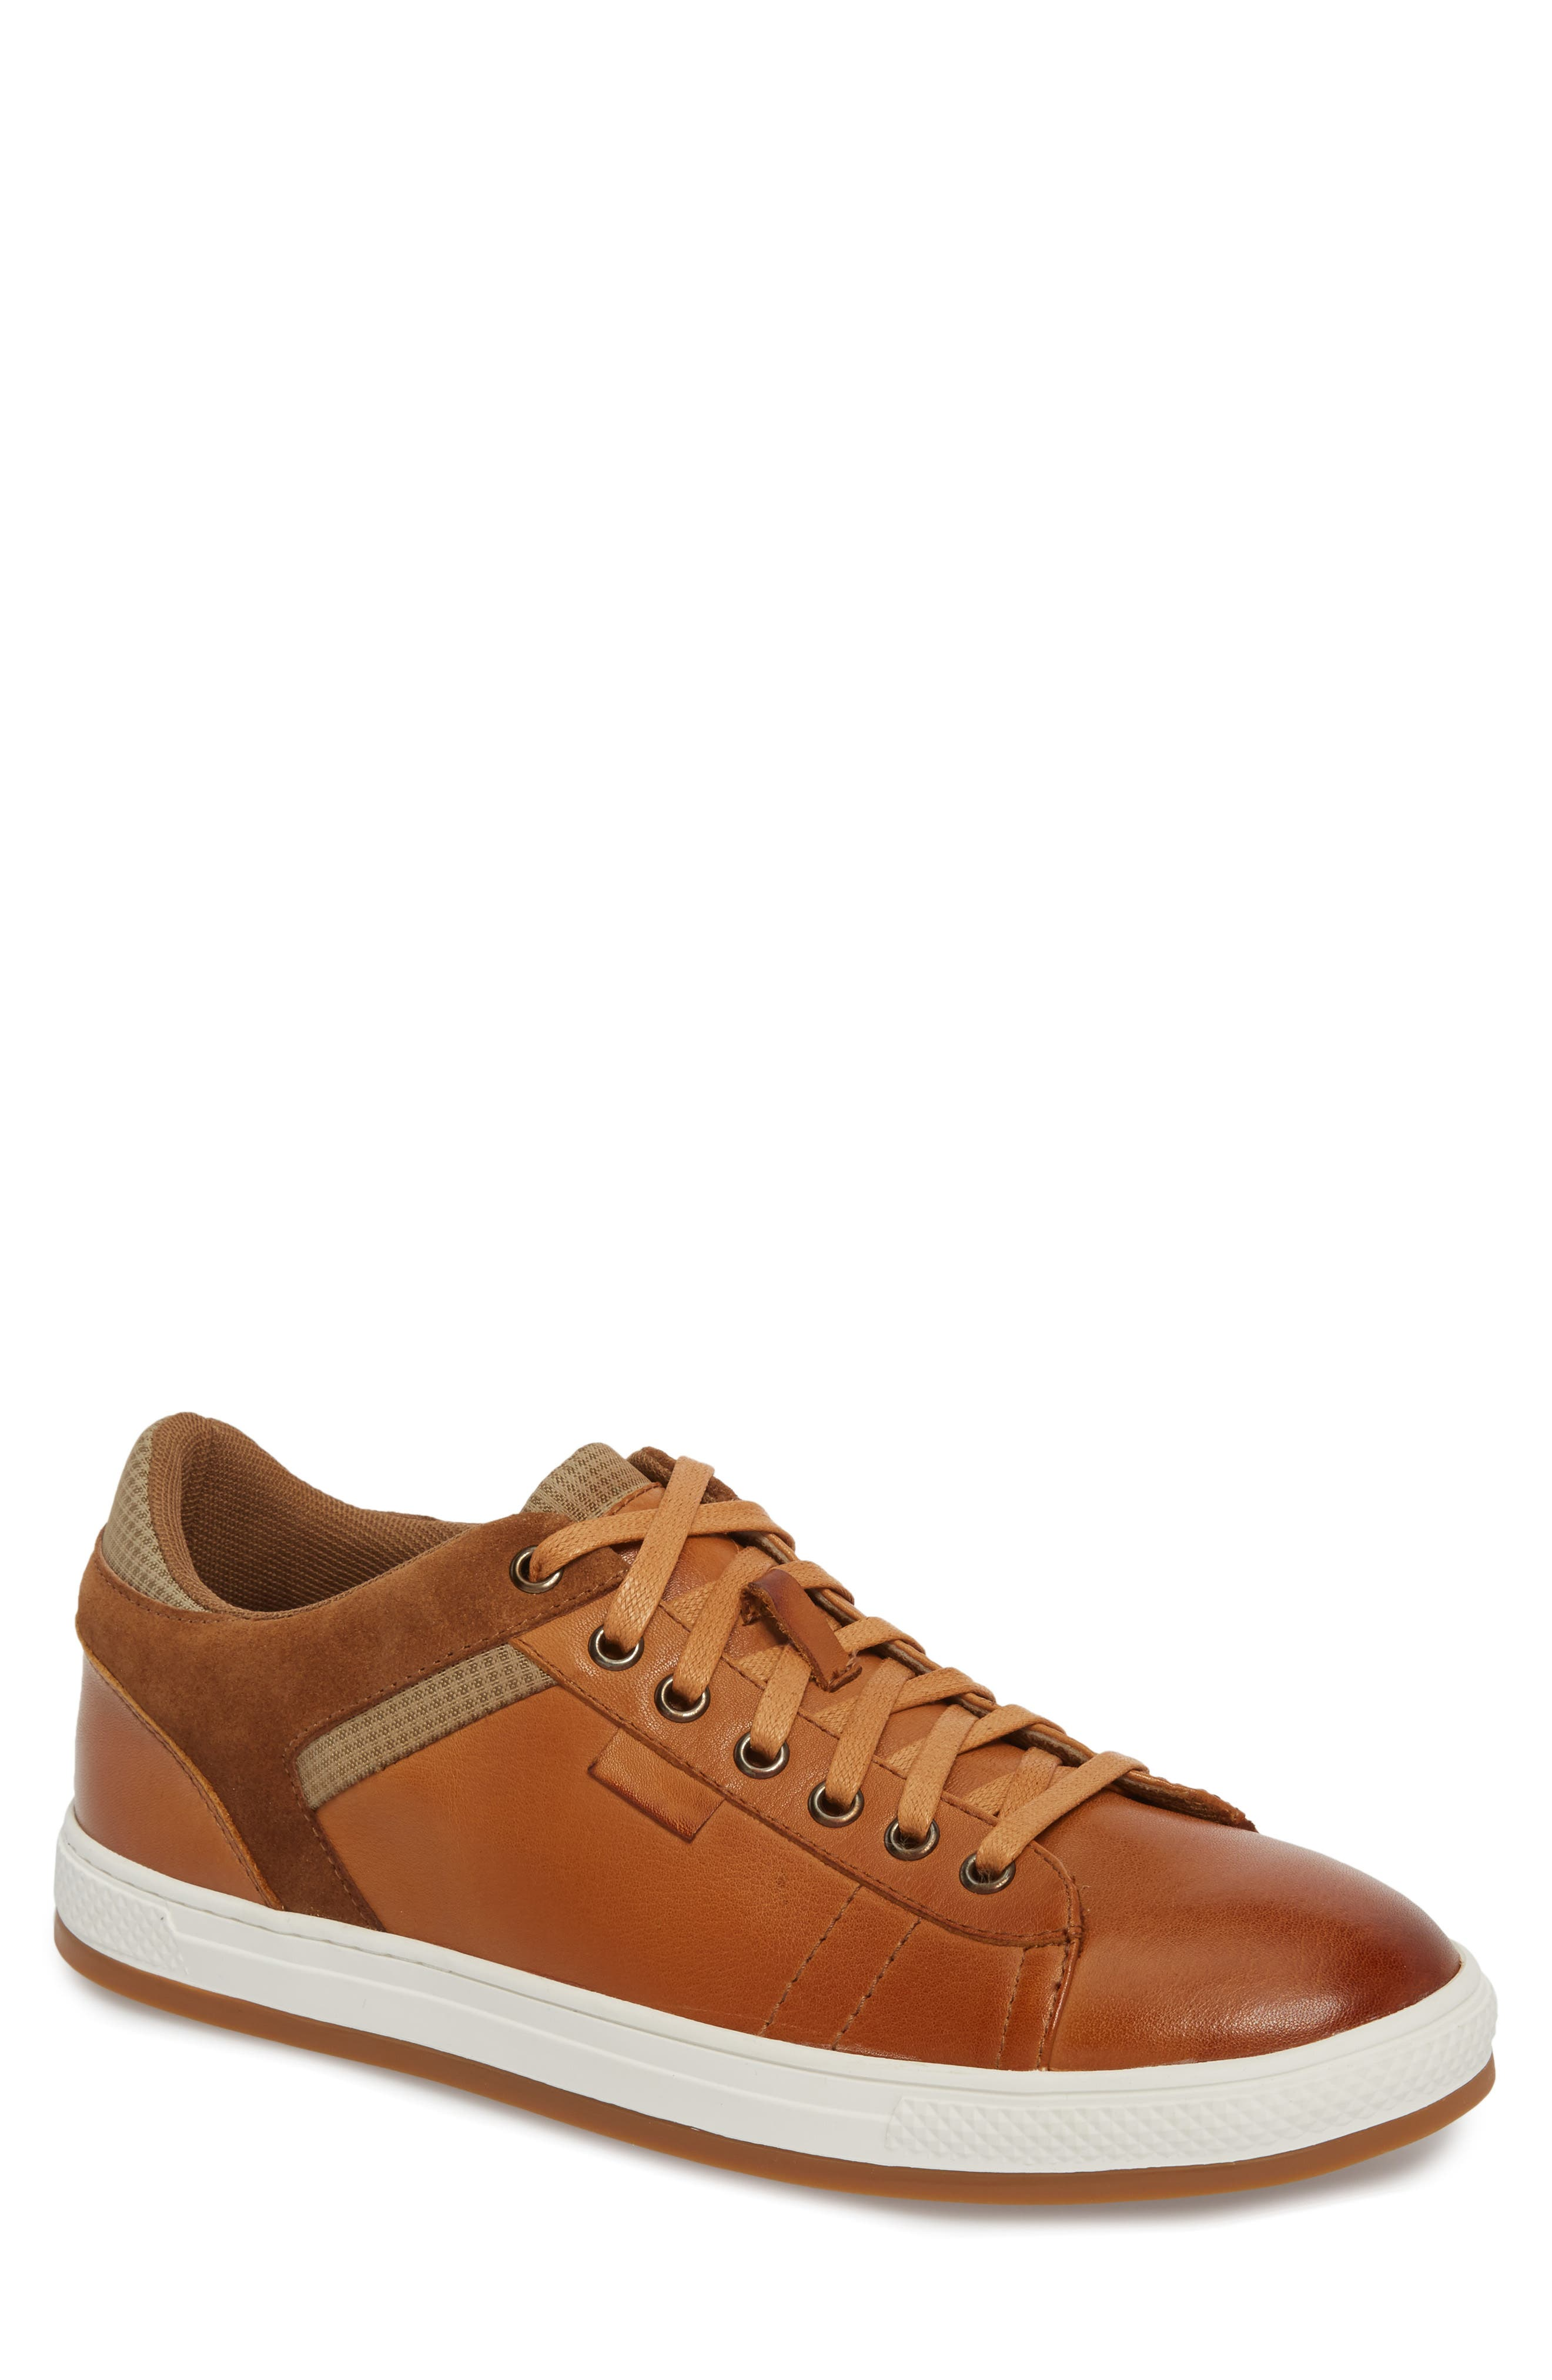 Ireton Low Top Sneaker,                         Main,                         color, Cognac Leather/ Suede